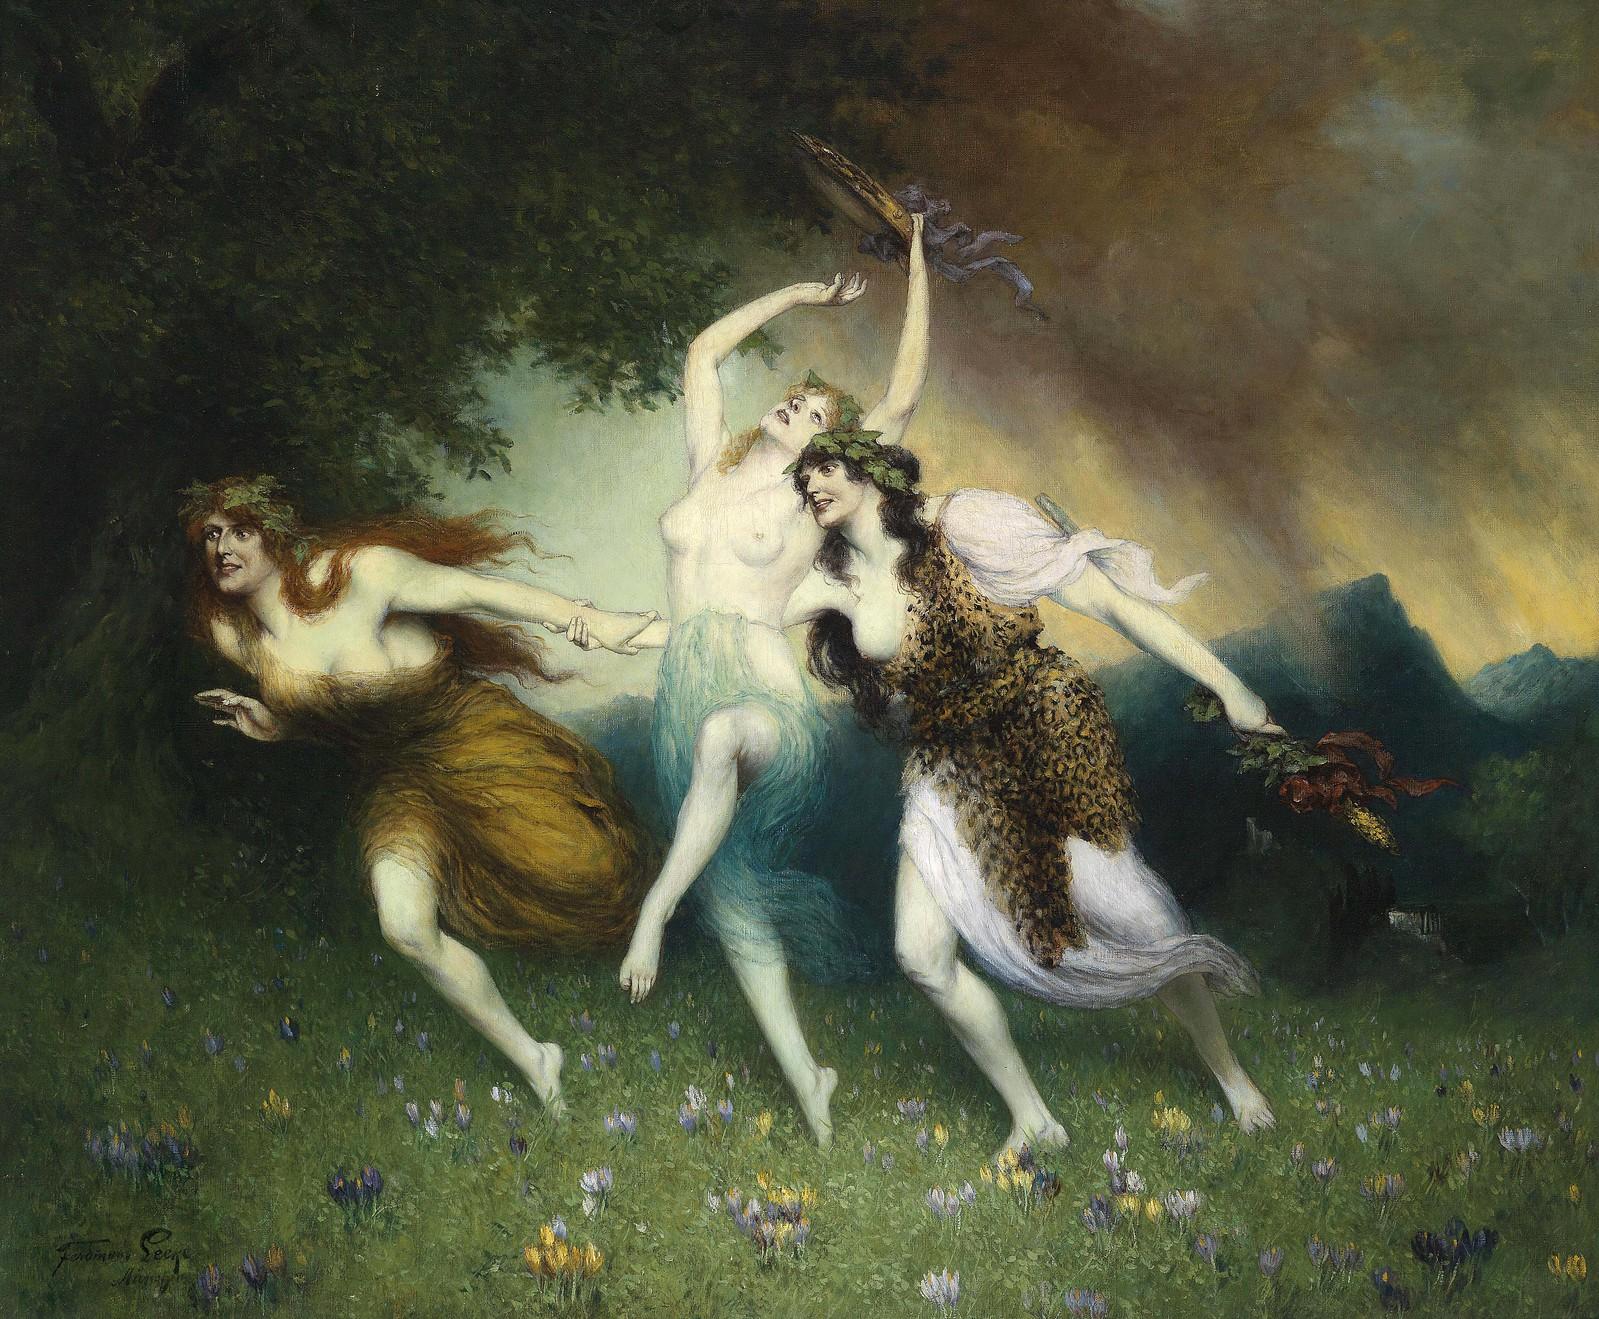 Ferdinand Leeke, Fliehende Nymphen, 1923